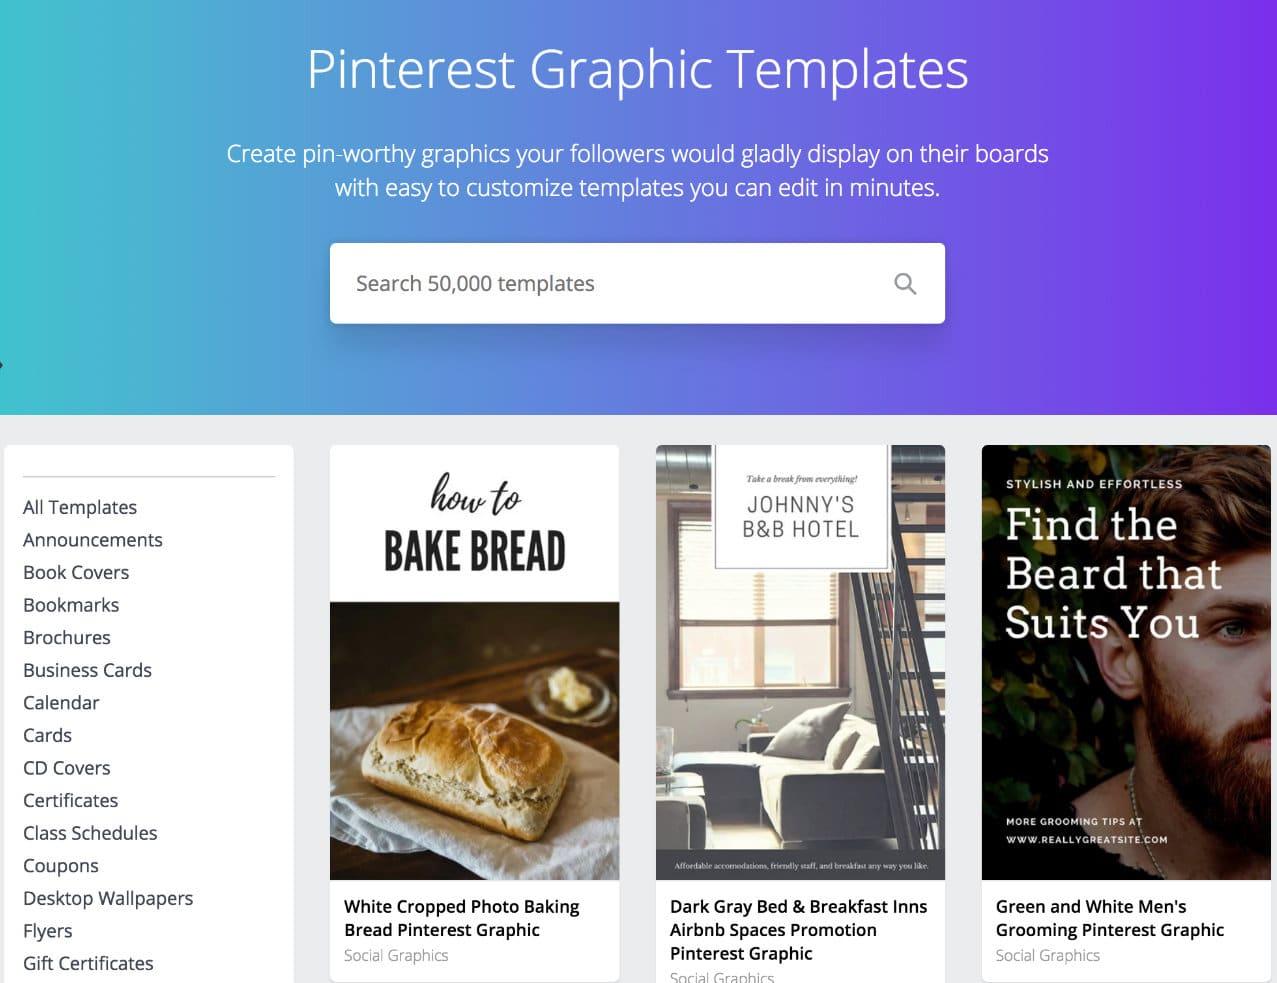 Modelos gráficos de Pinterest